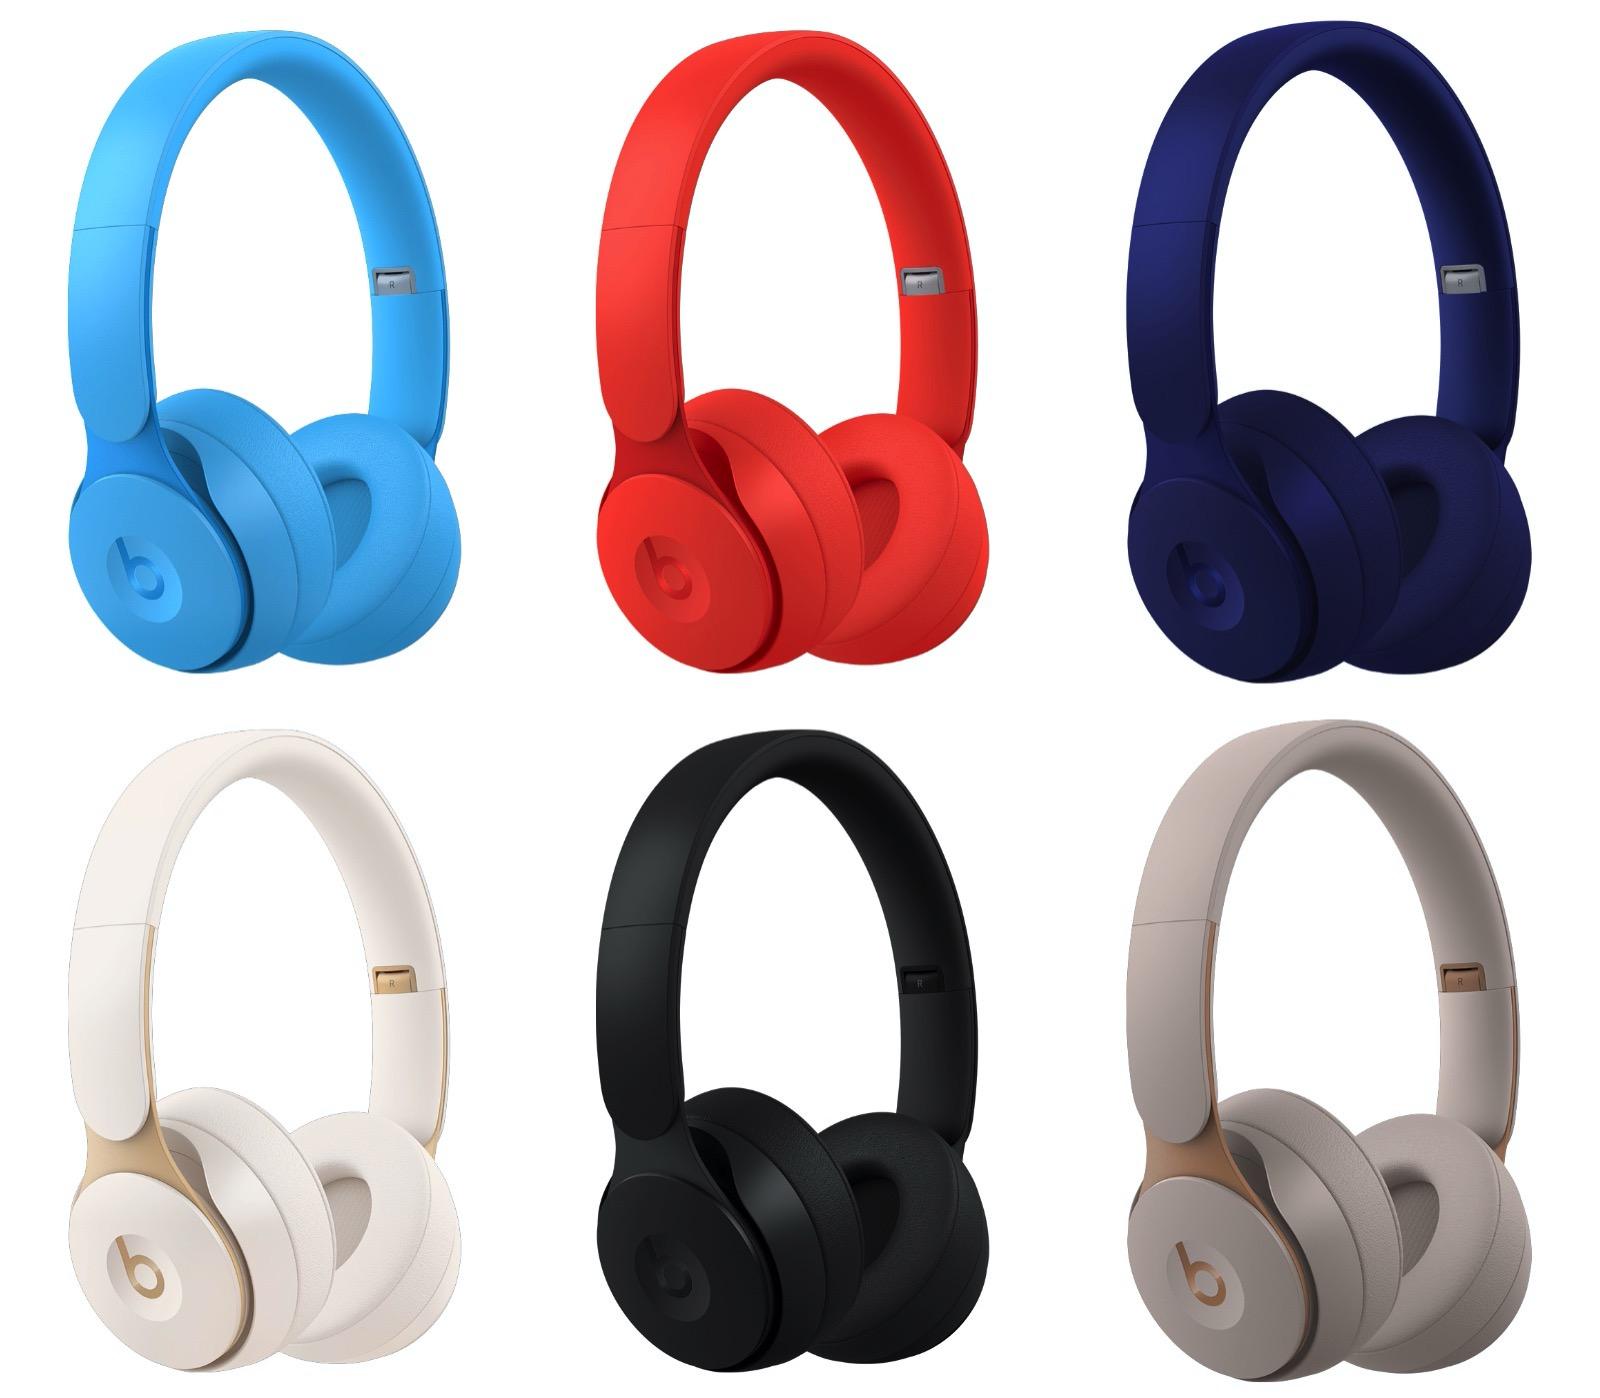 Beats-Solo-Pro-colors.jpg